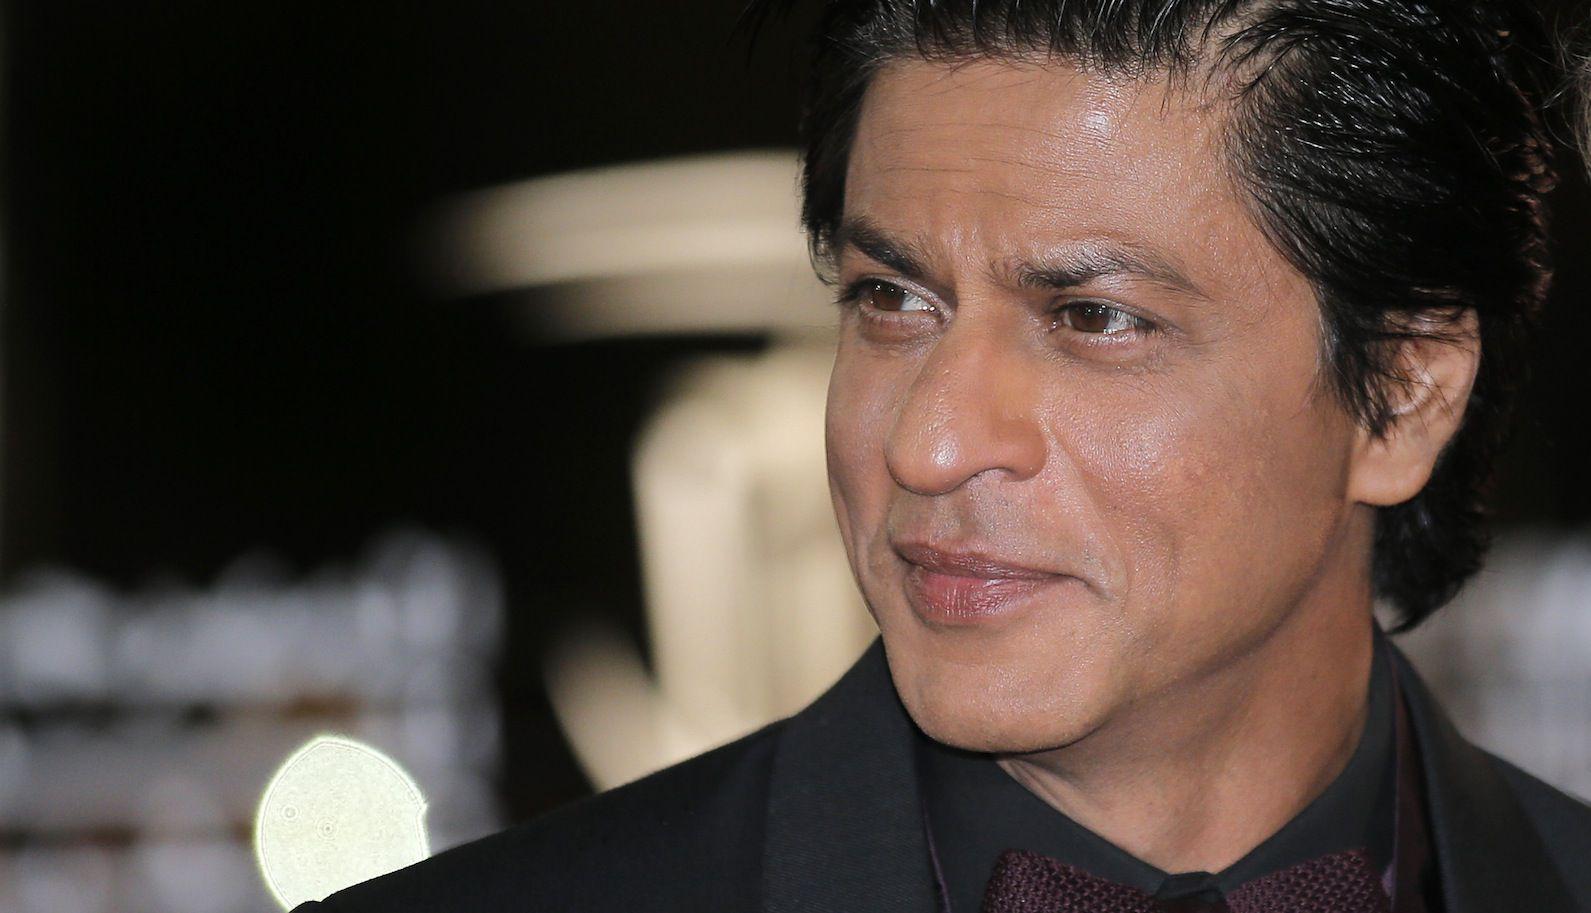 Indian film actor Shahrukh Khan arrives at the Marrakech International Film Festival in Marrakech, Saturday, Dec.1, 2012 at the Marrakech Congress Palace. The Film Festival take place until Dec.8. (AP Photo/Lionel Cironneau)